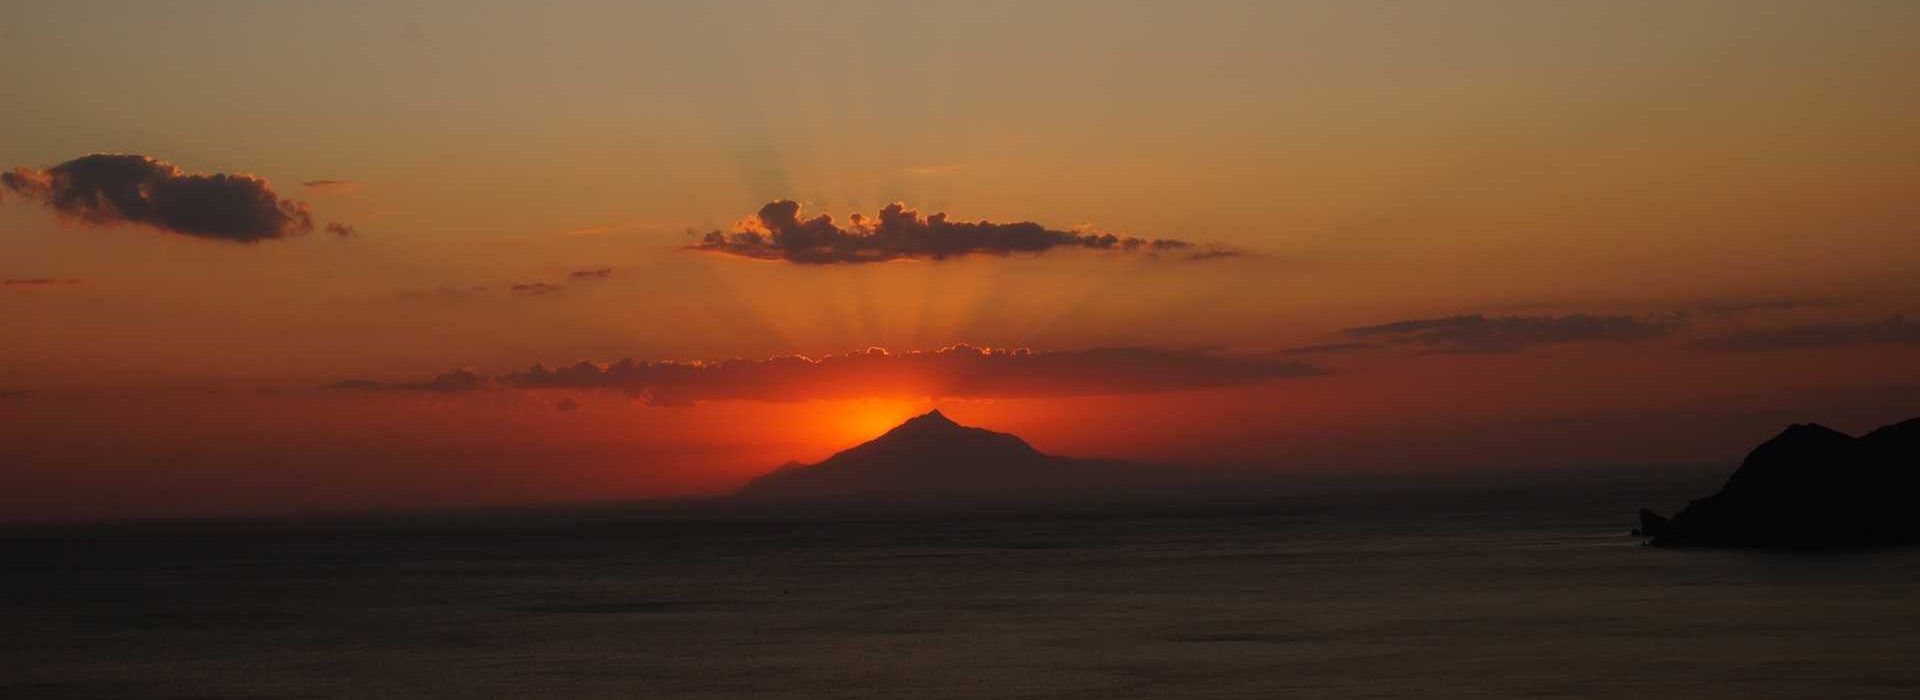 sunset-2-1920